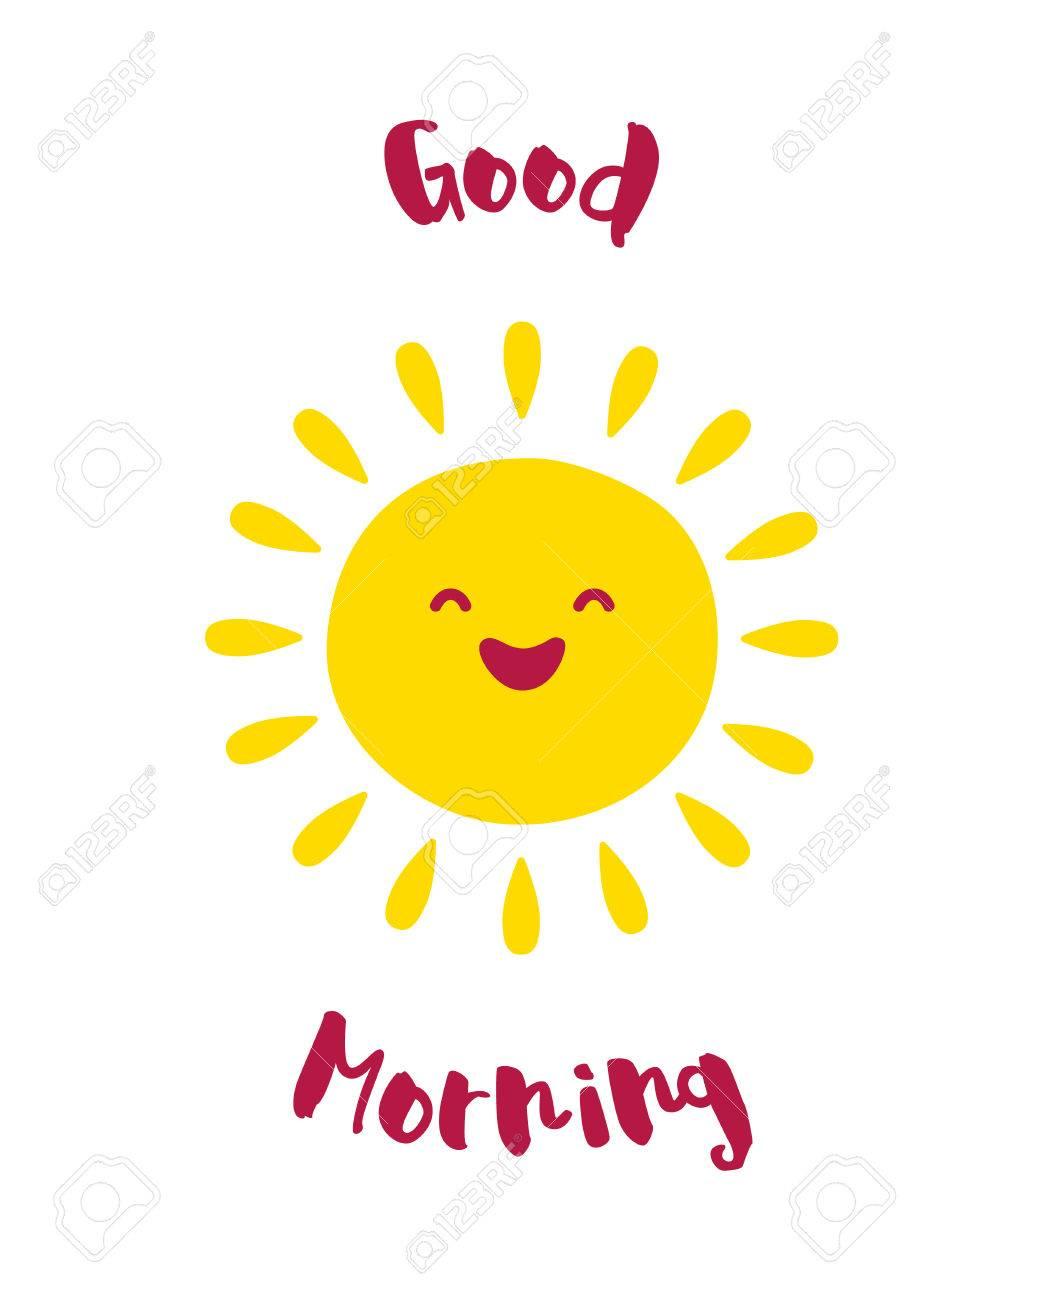 Unique Cartoon Good Morning Image